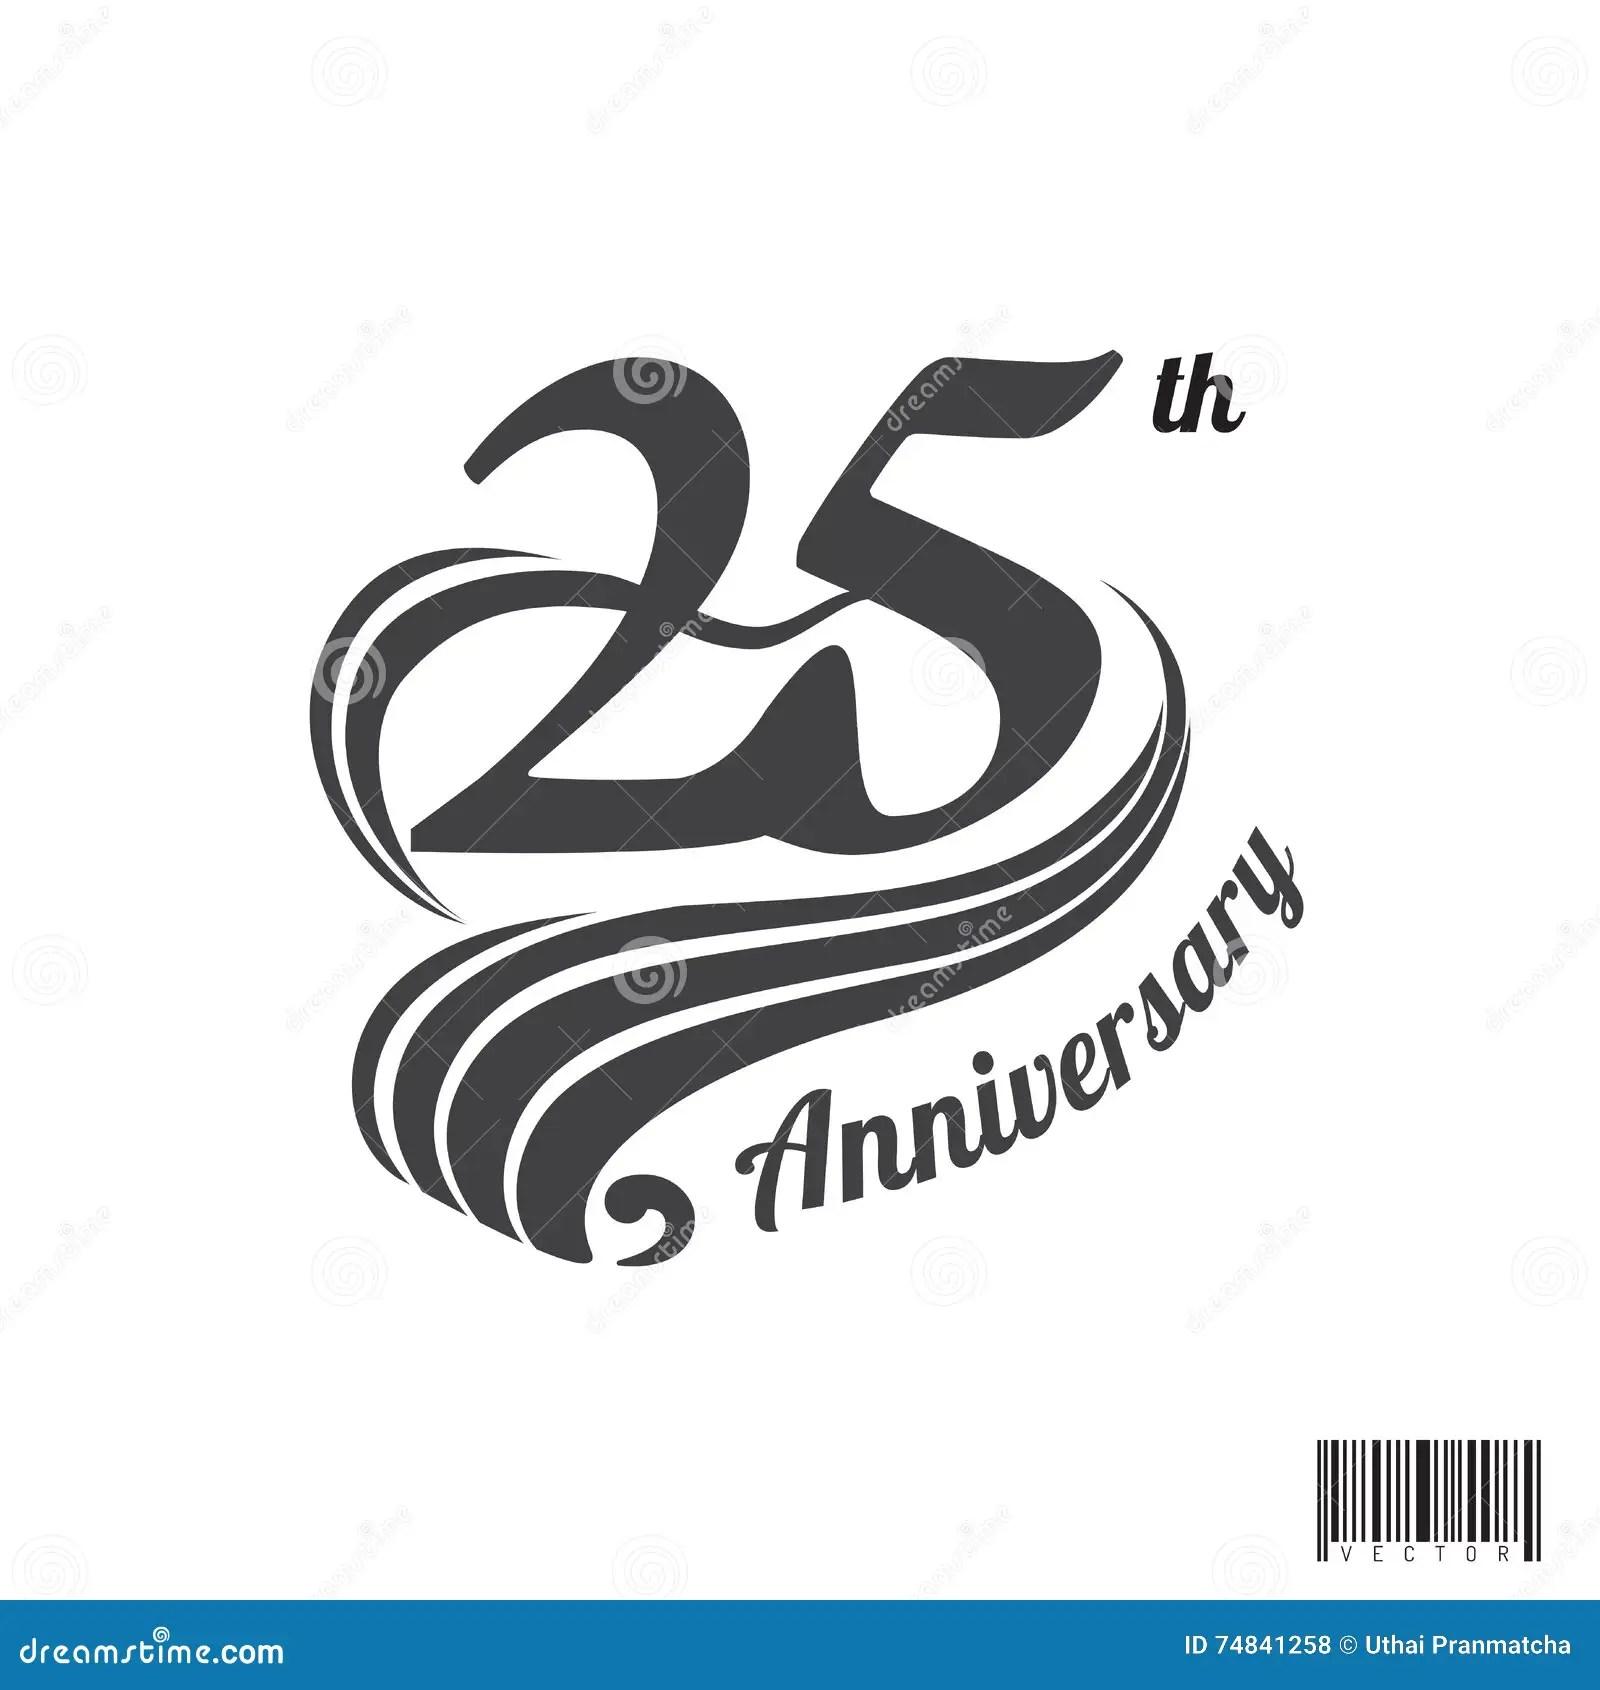 25 Th Anniversary Logo And Symbol Design Stock Vector